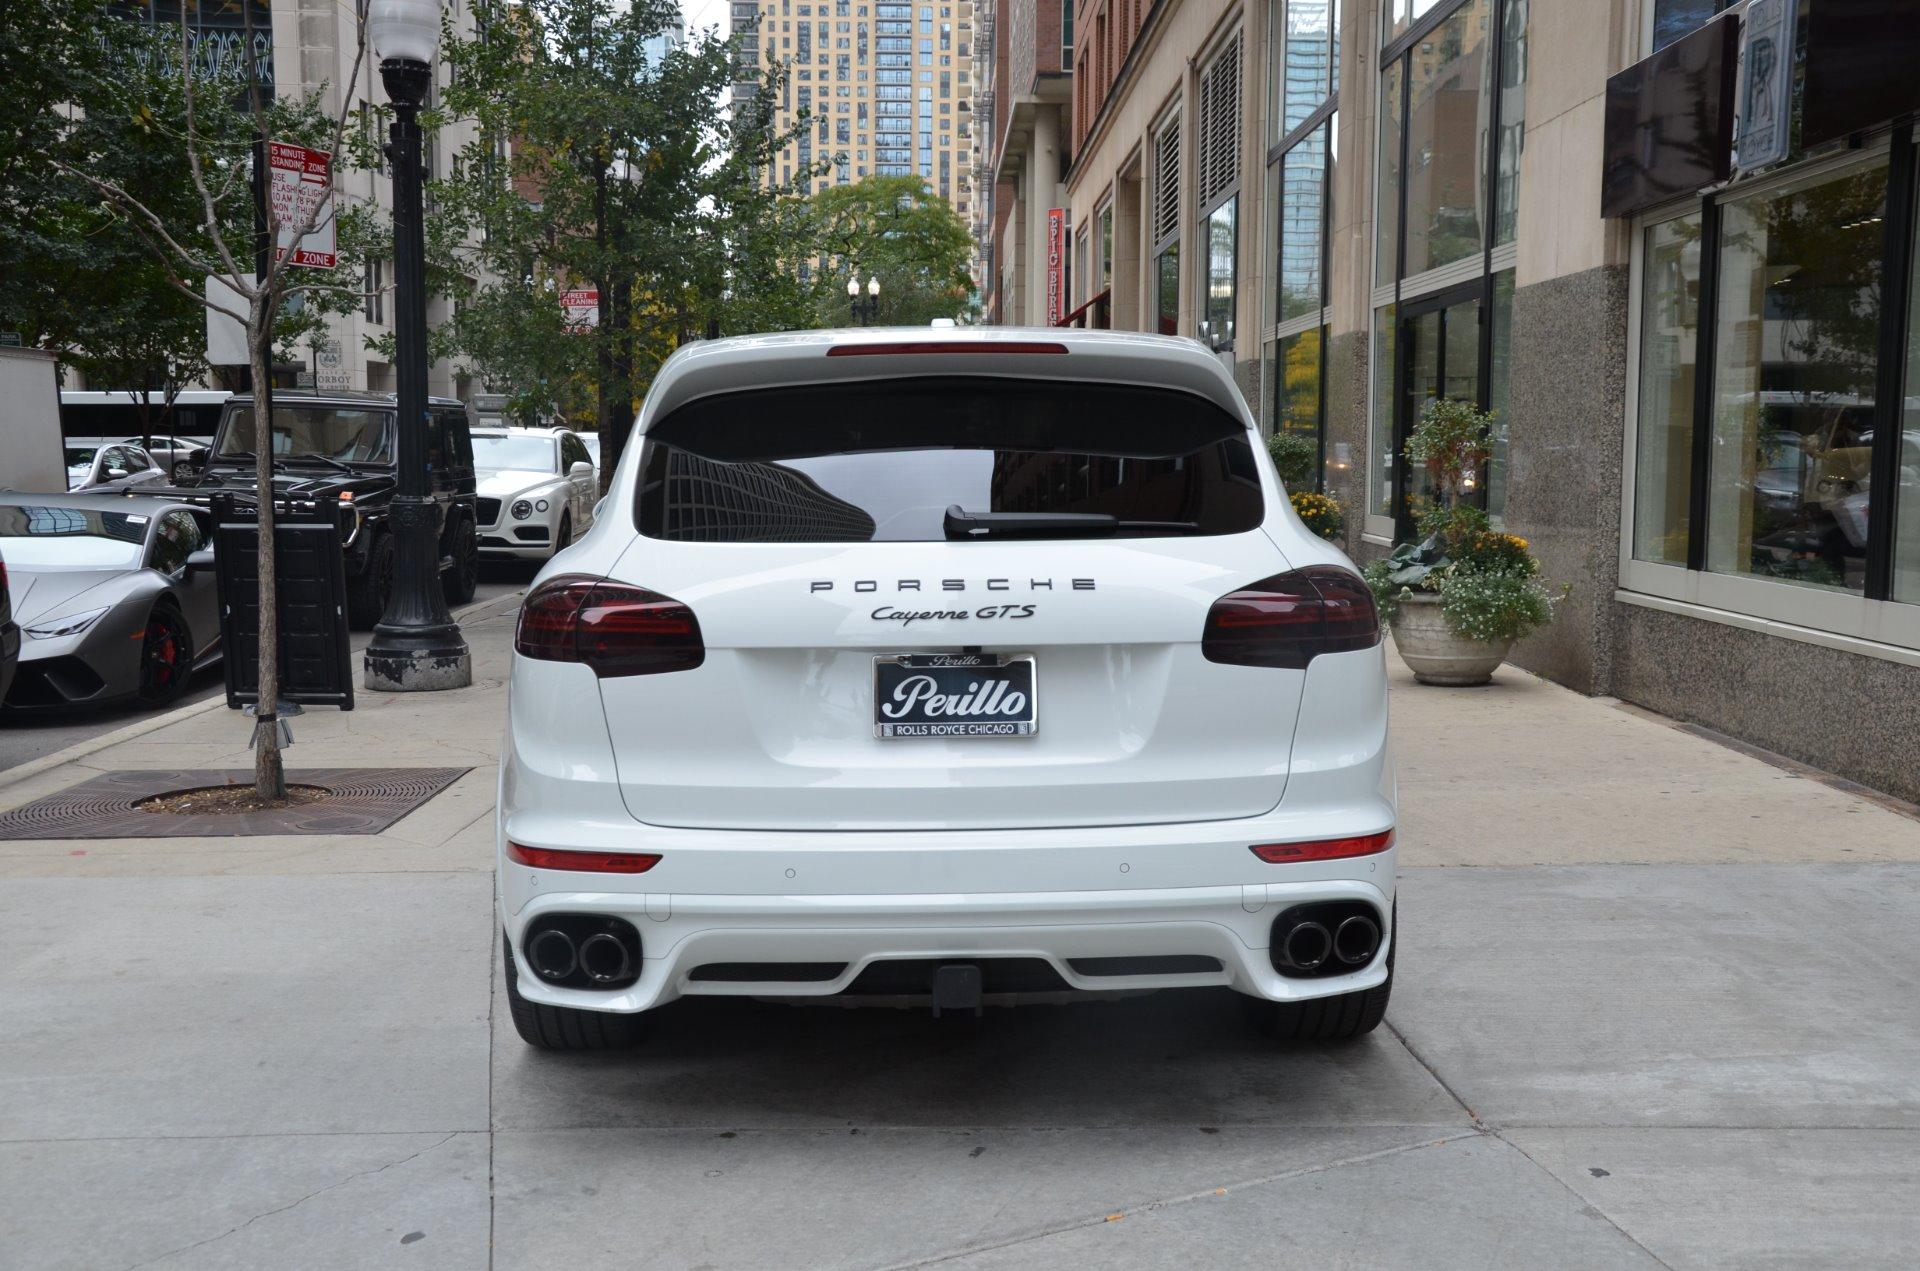 Porsche Cayenne Gts For Sale >> 2017 Porsche Cayenne Gts Stock L304c For Sale Near Chicago